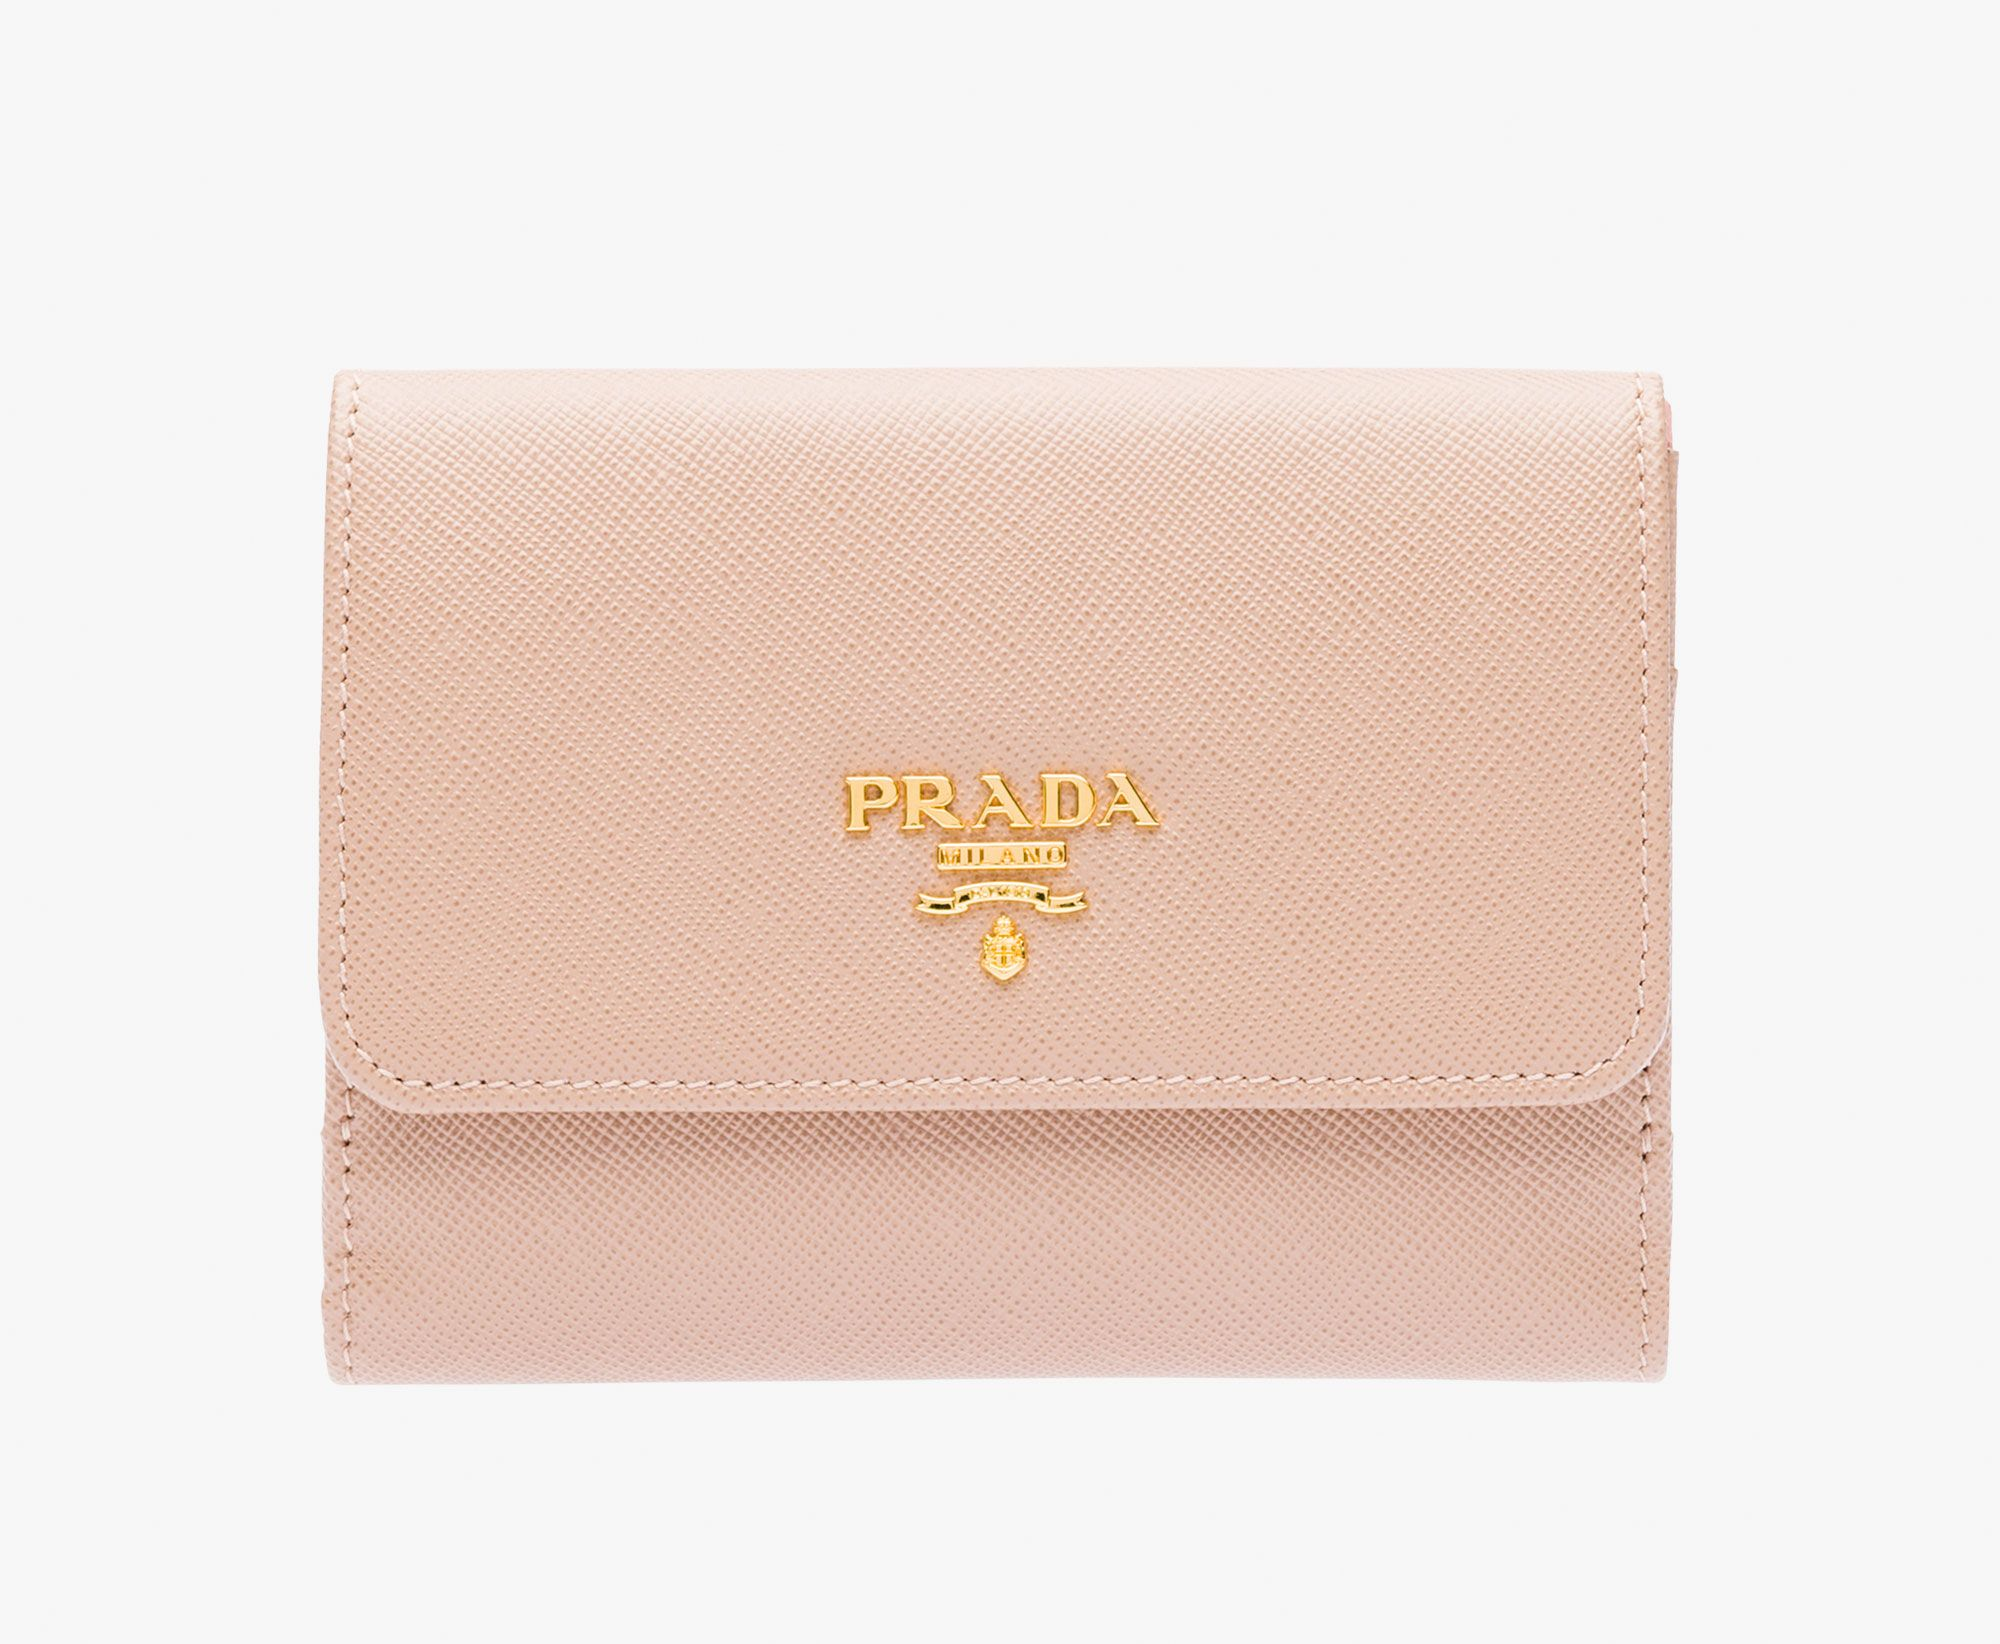 Prada Woman - Wallet - Cameo + orchid - 1MH523_ZLP_F0E13